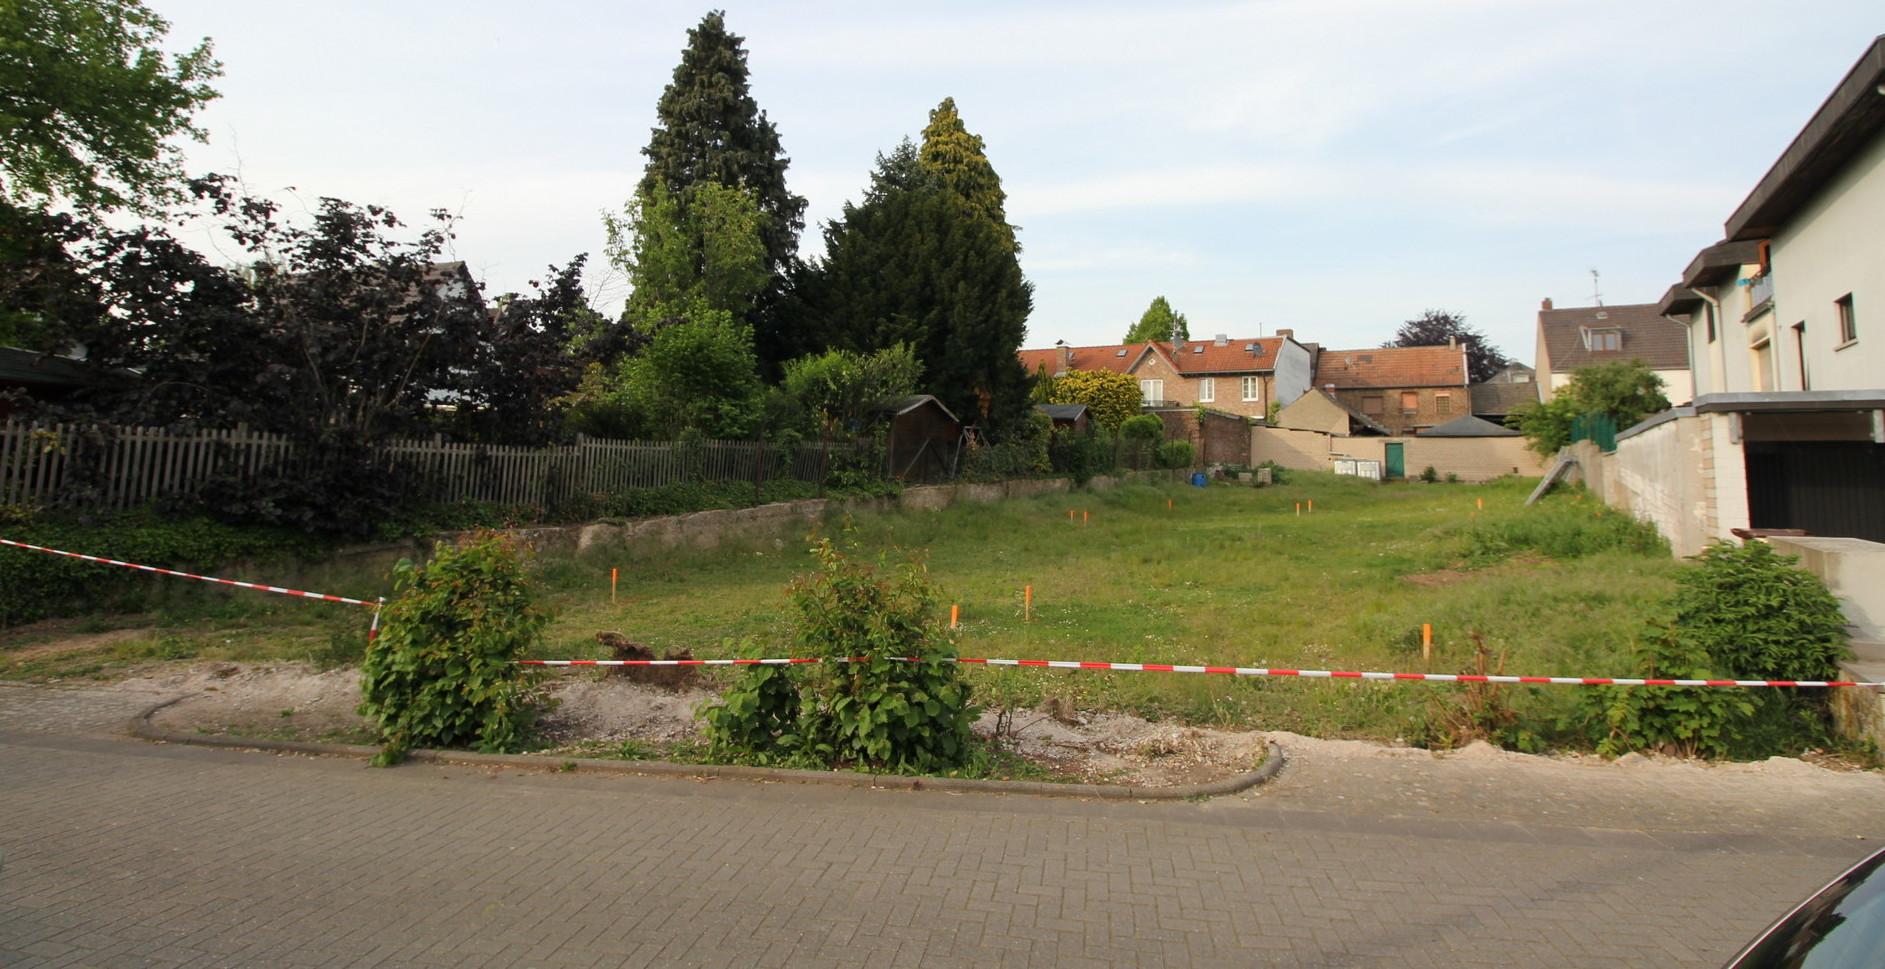 Bauvorhaben Mehrfamilienhaus in Pulheim | www.artos-haus.de | Foto 1